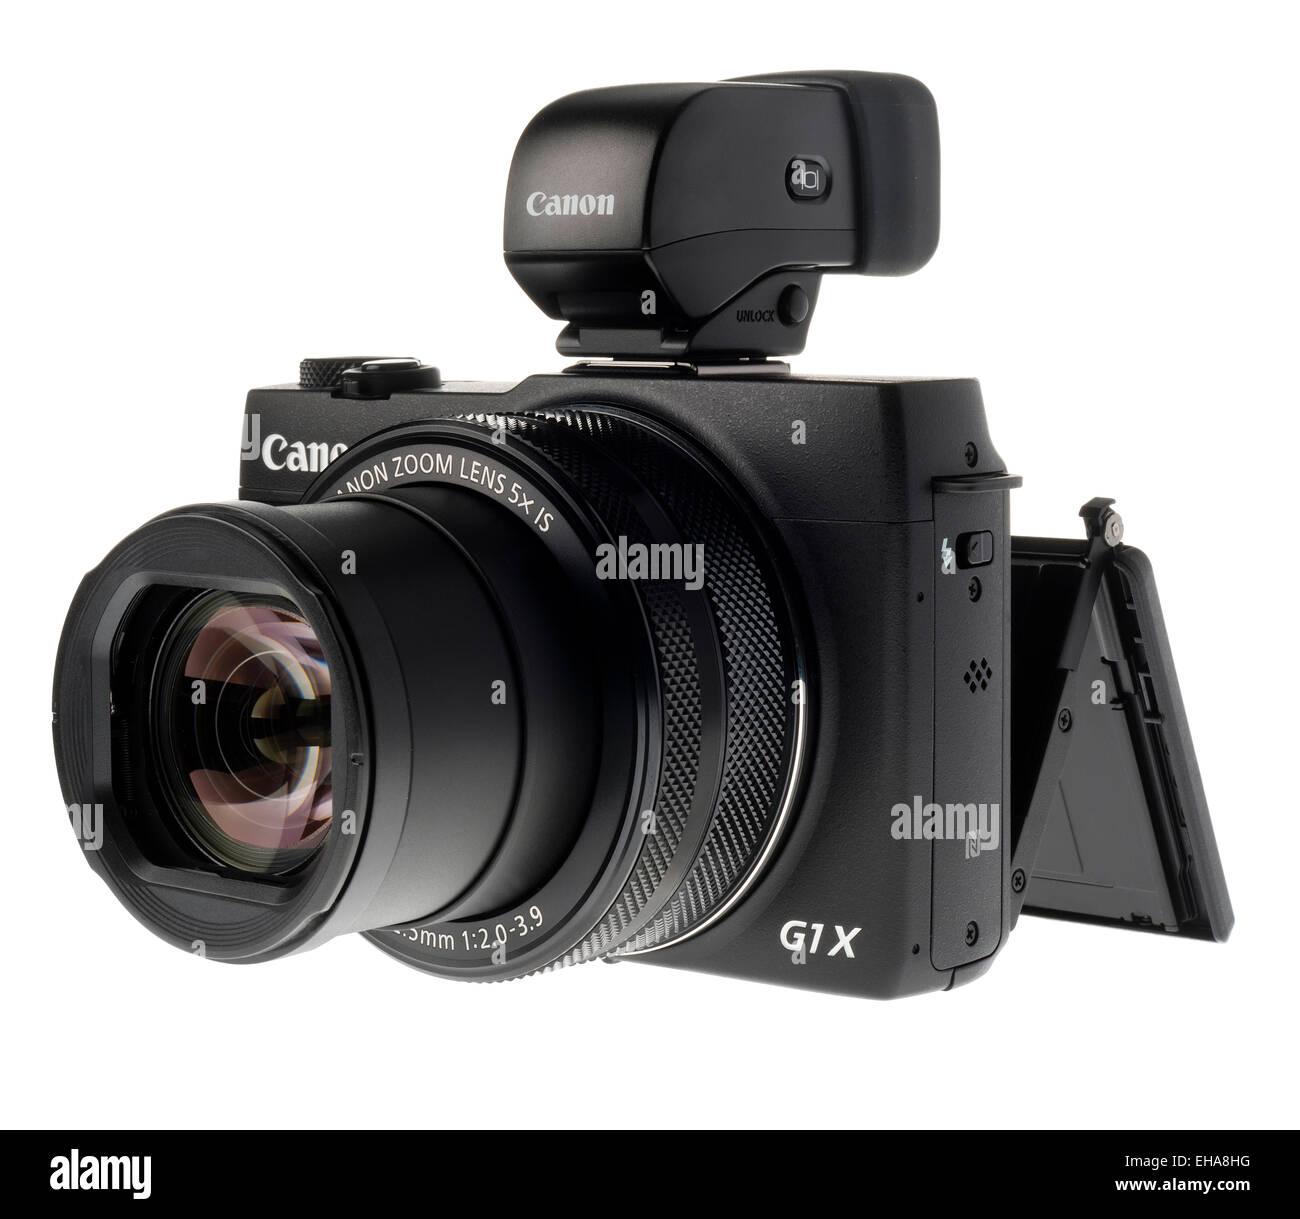 Canon G1X digital camera. - Stock Image